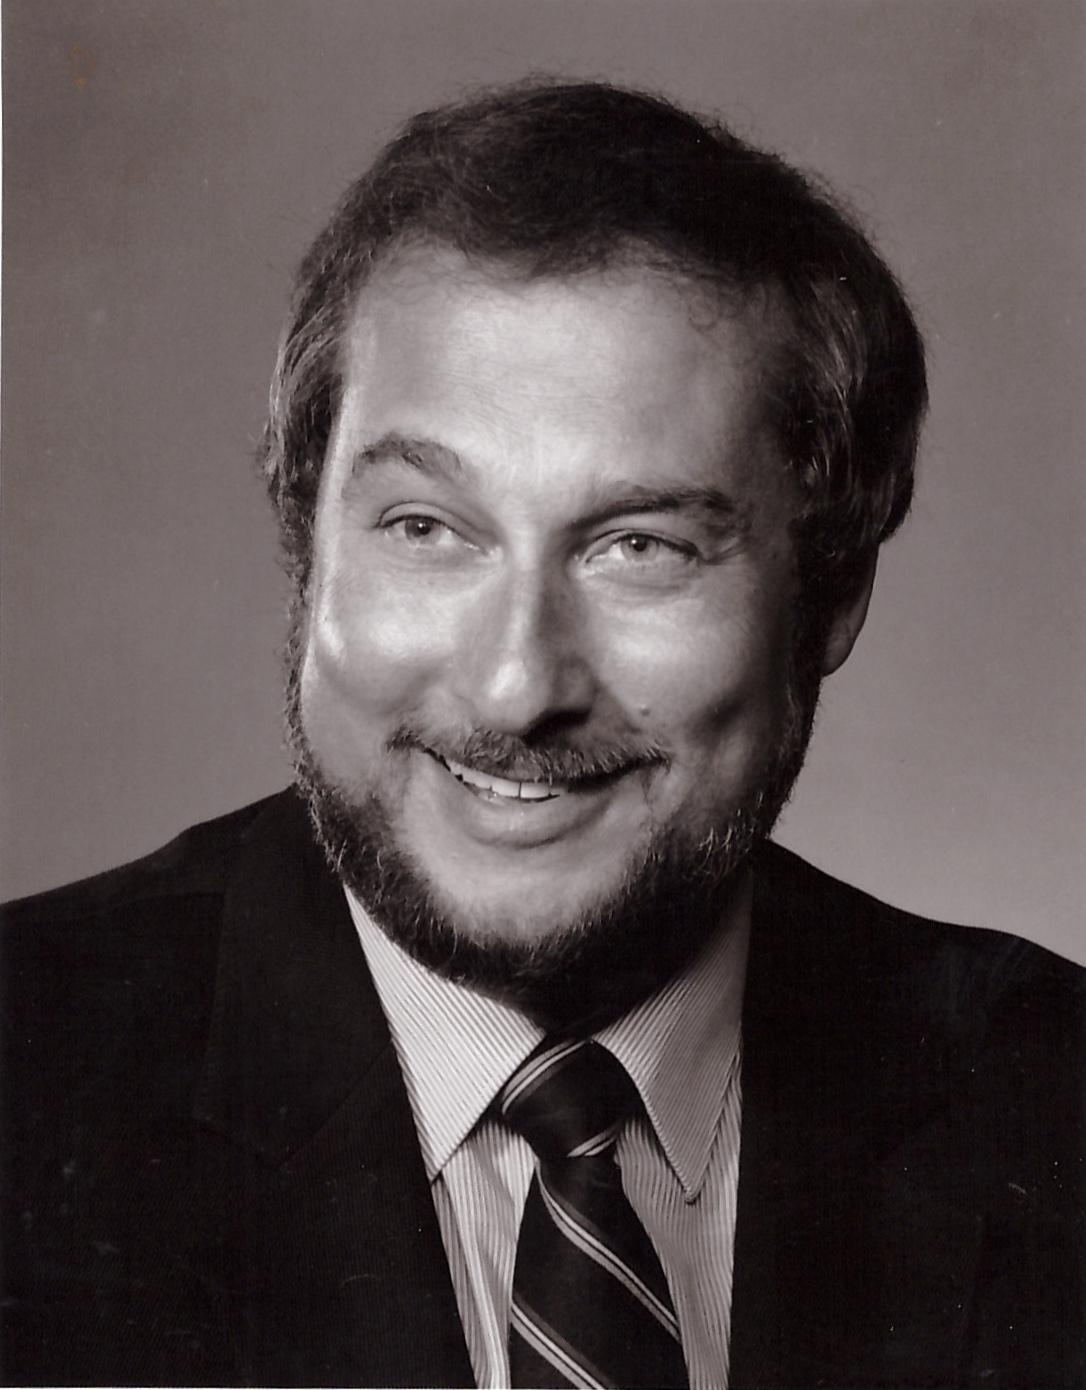 Dr. Richard Boroditsky